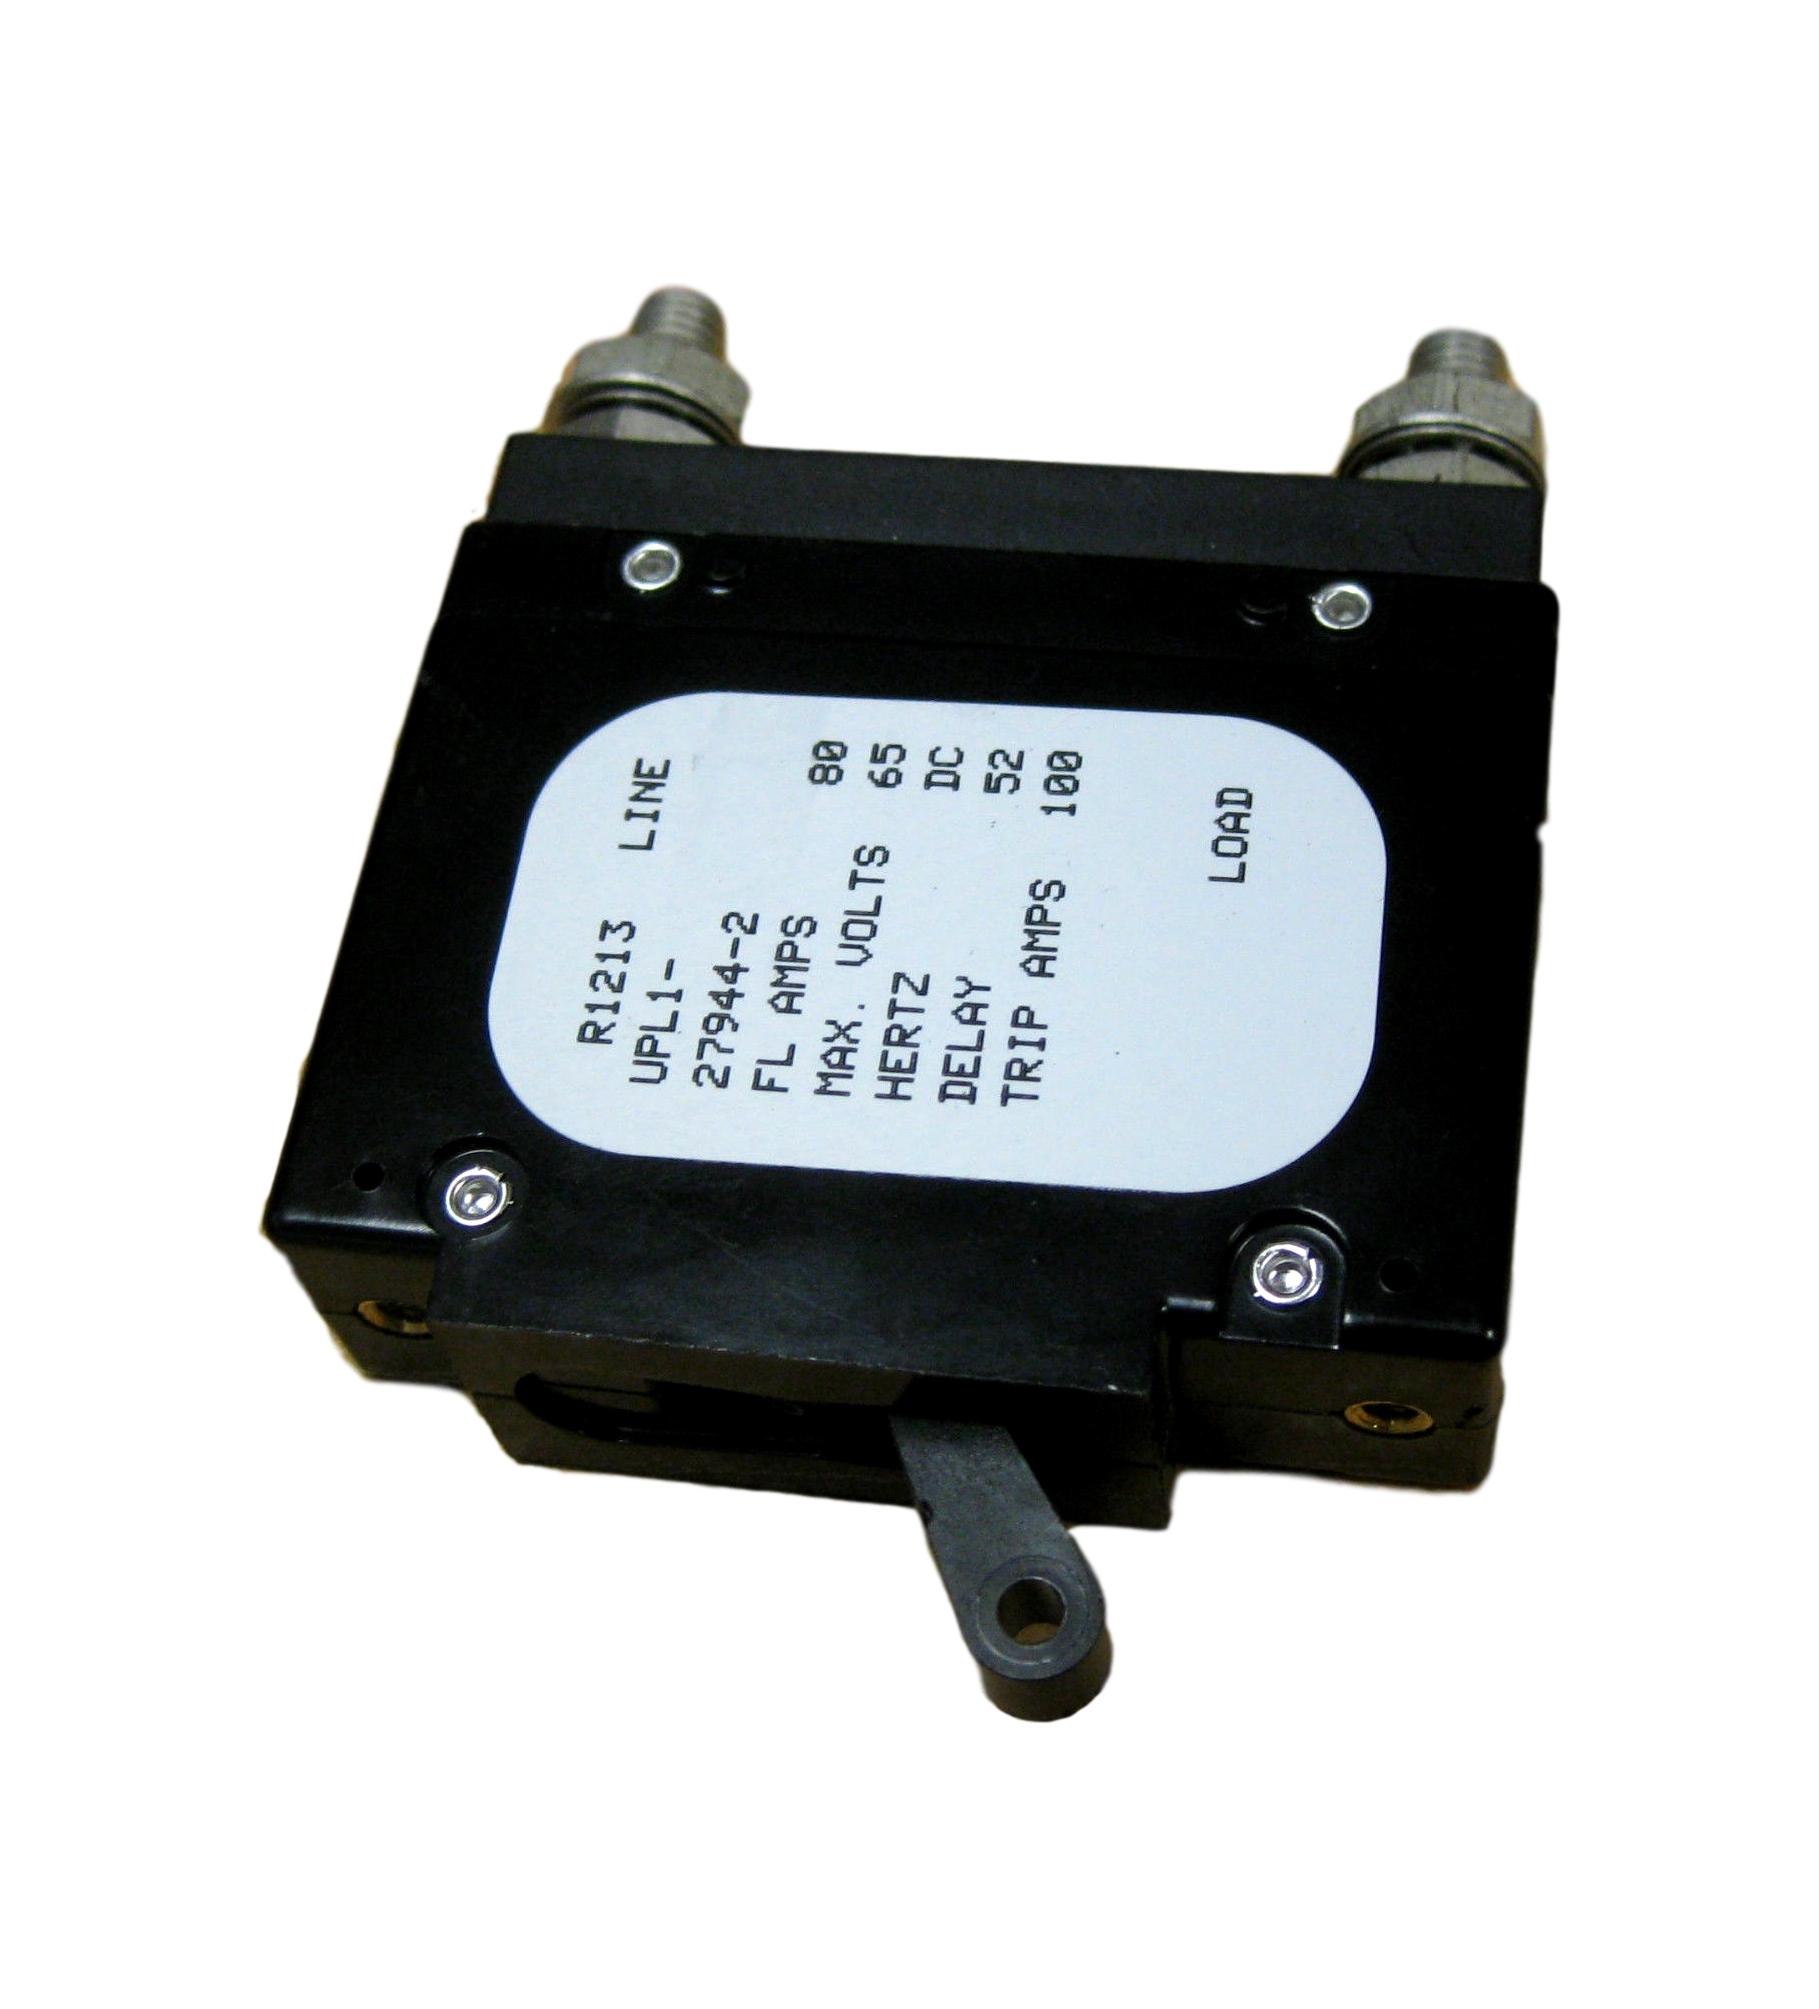 NEW Sensata Klixon NDLA-135-1 Circuit Breaker SwitchAuto 135 amp SDLA-135-1